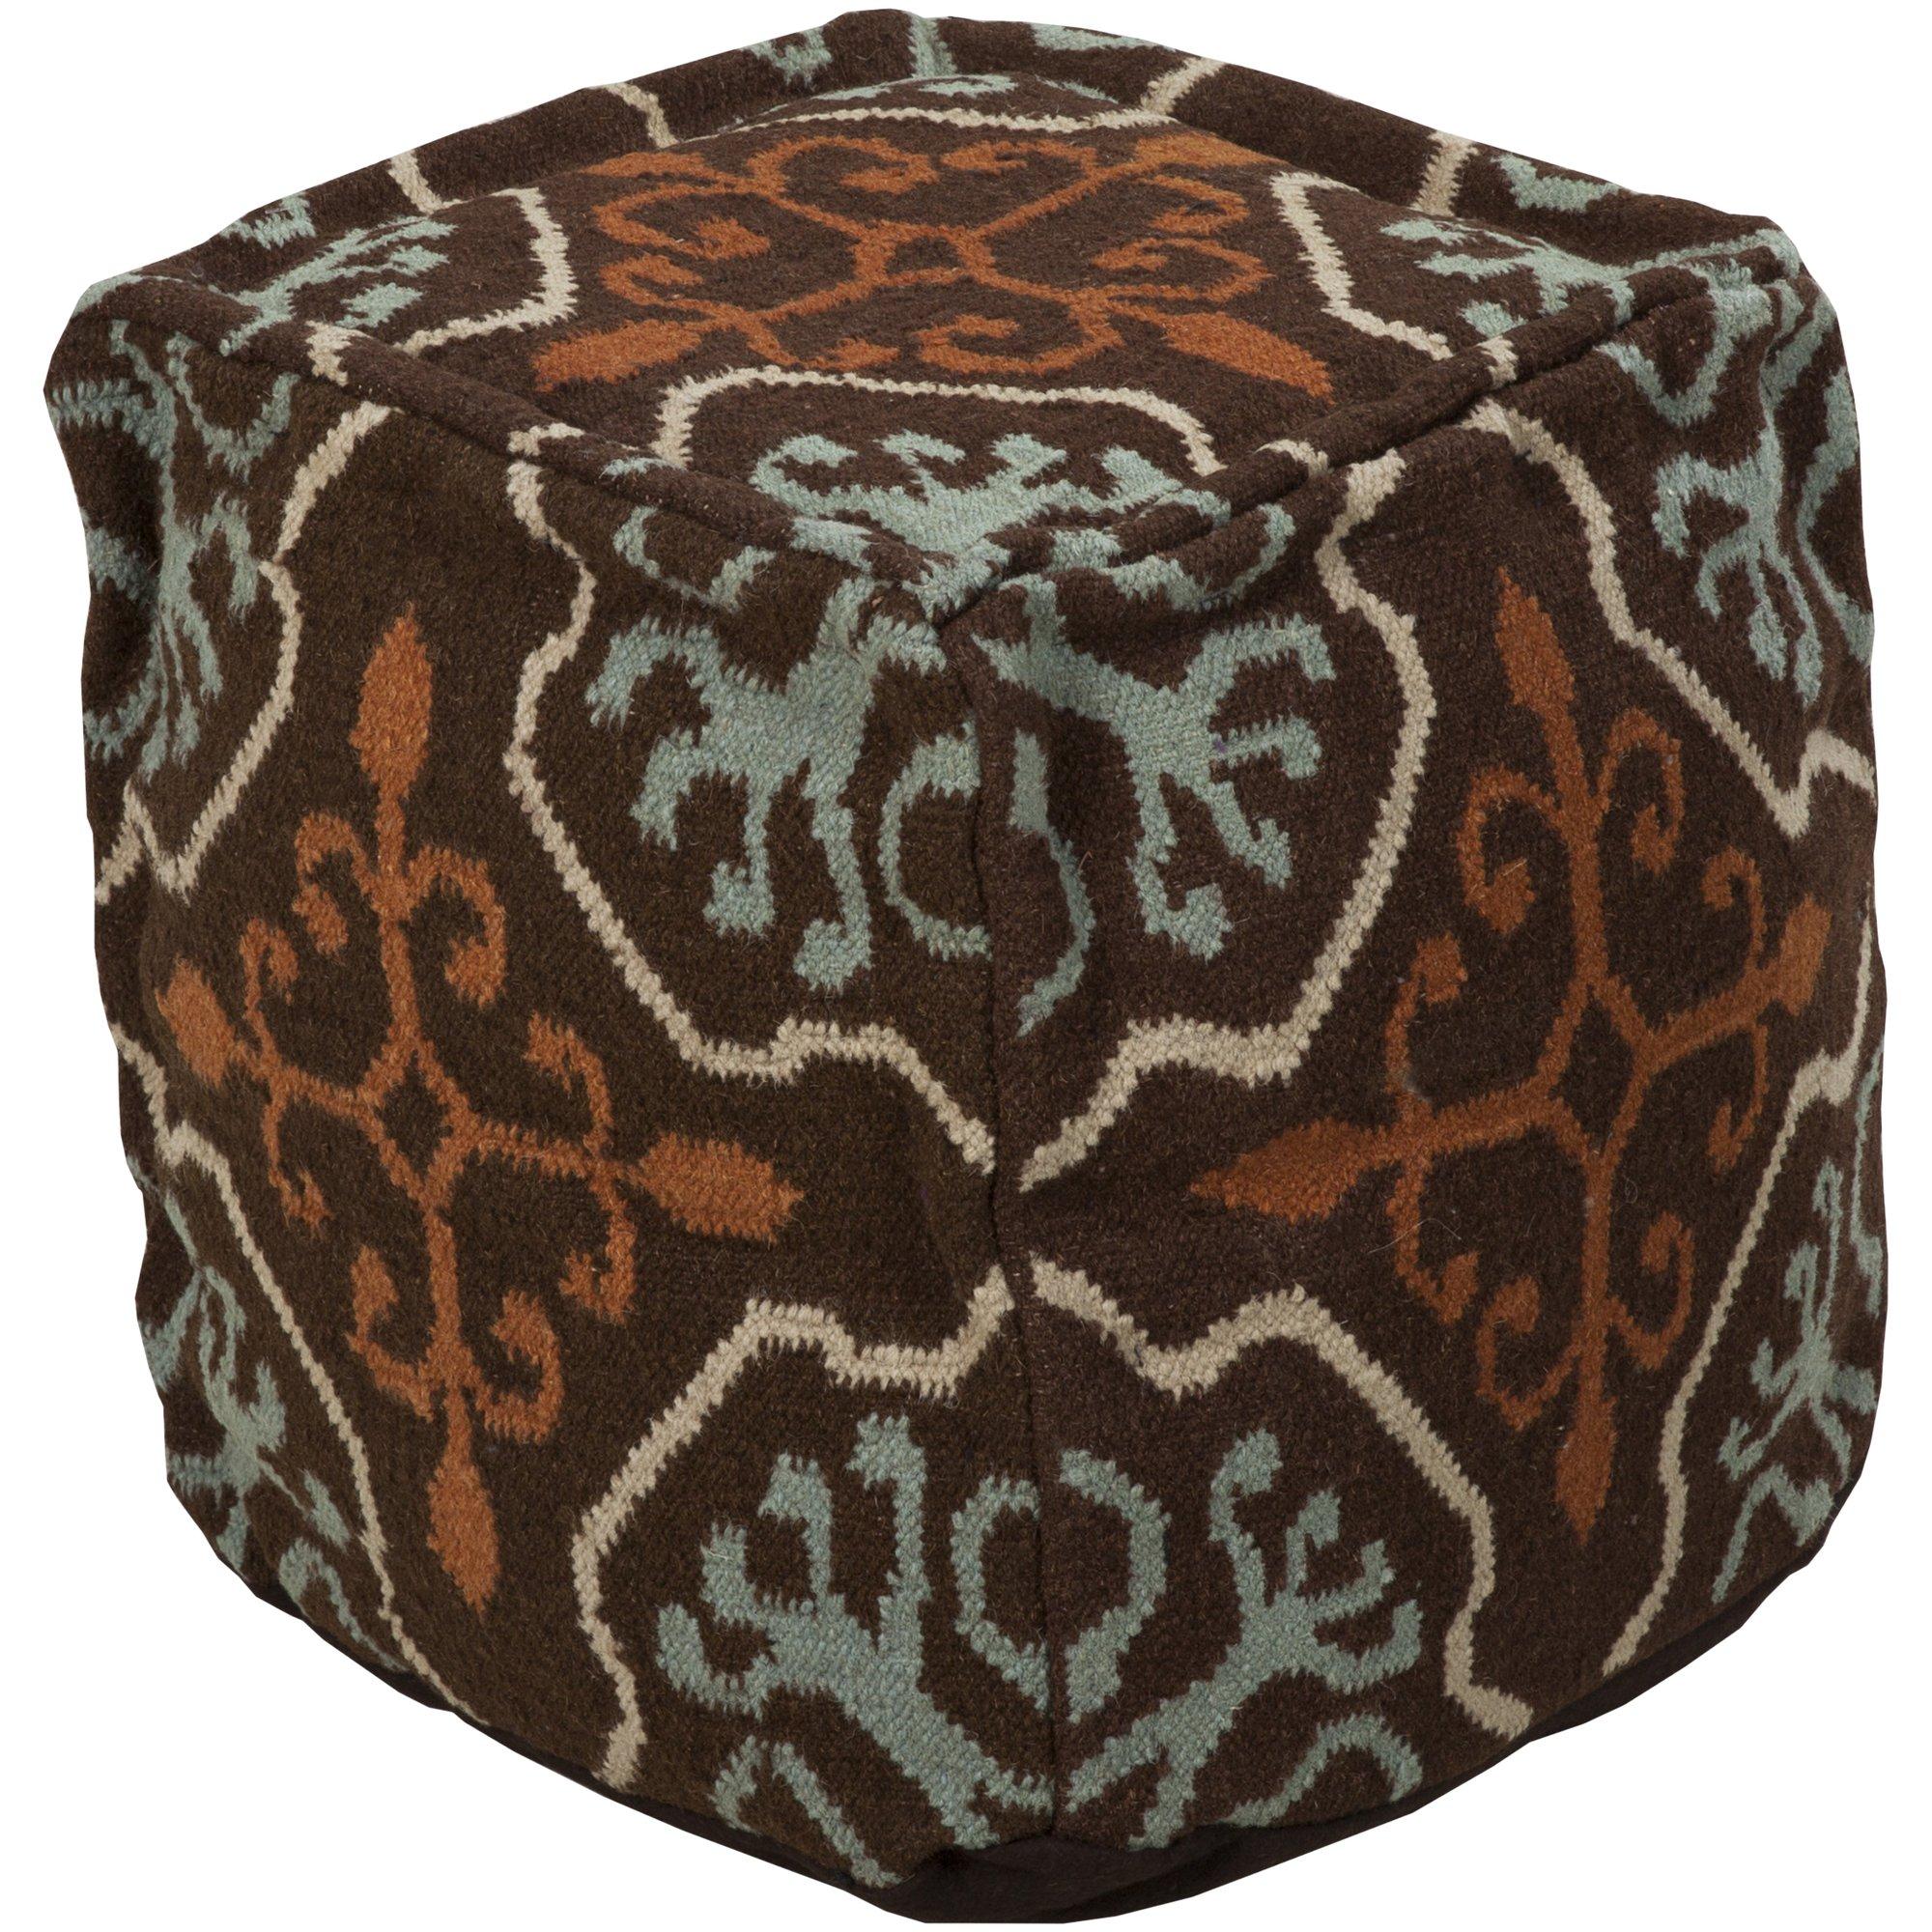 Surya POUF-18 Hand Made 100% Wool Burgundy 18'' x 18'' x 18'' Pouf